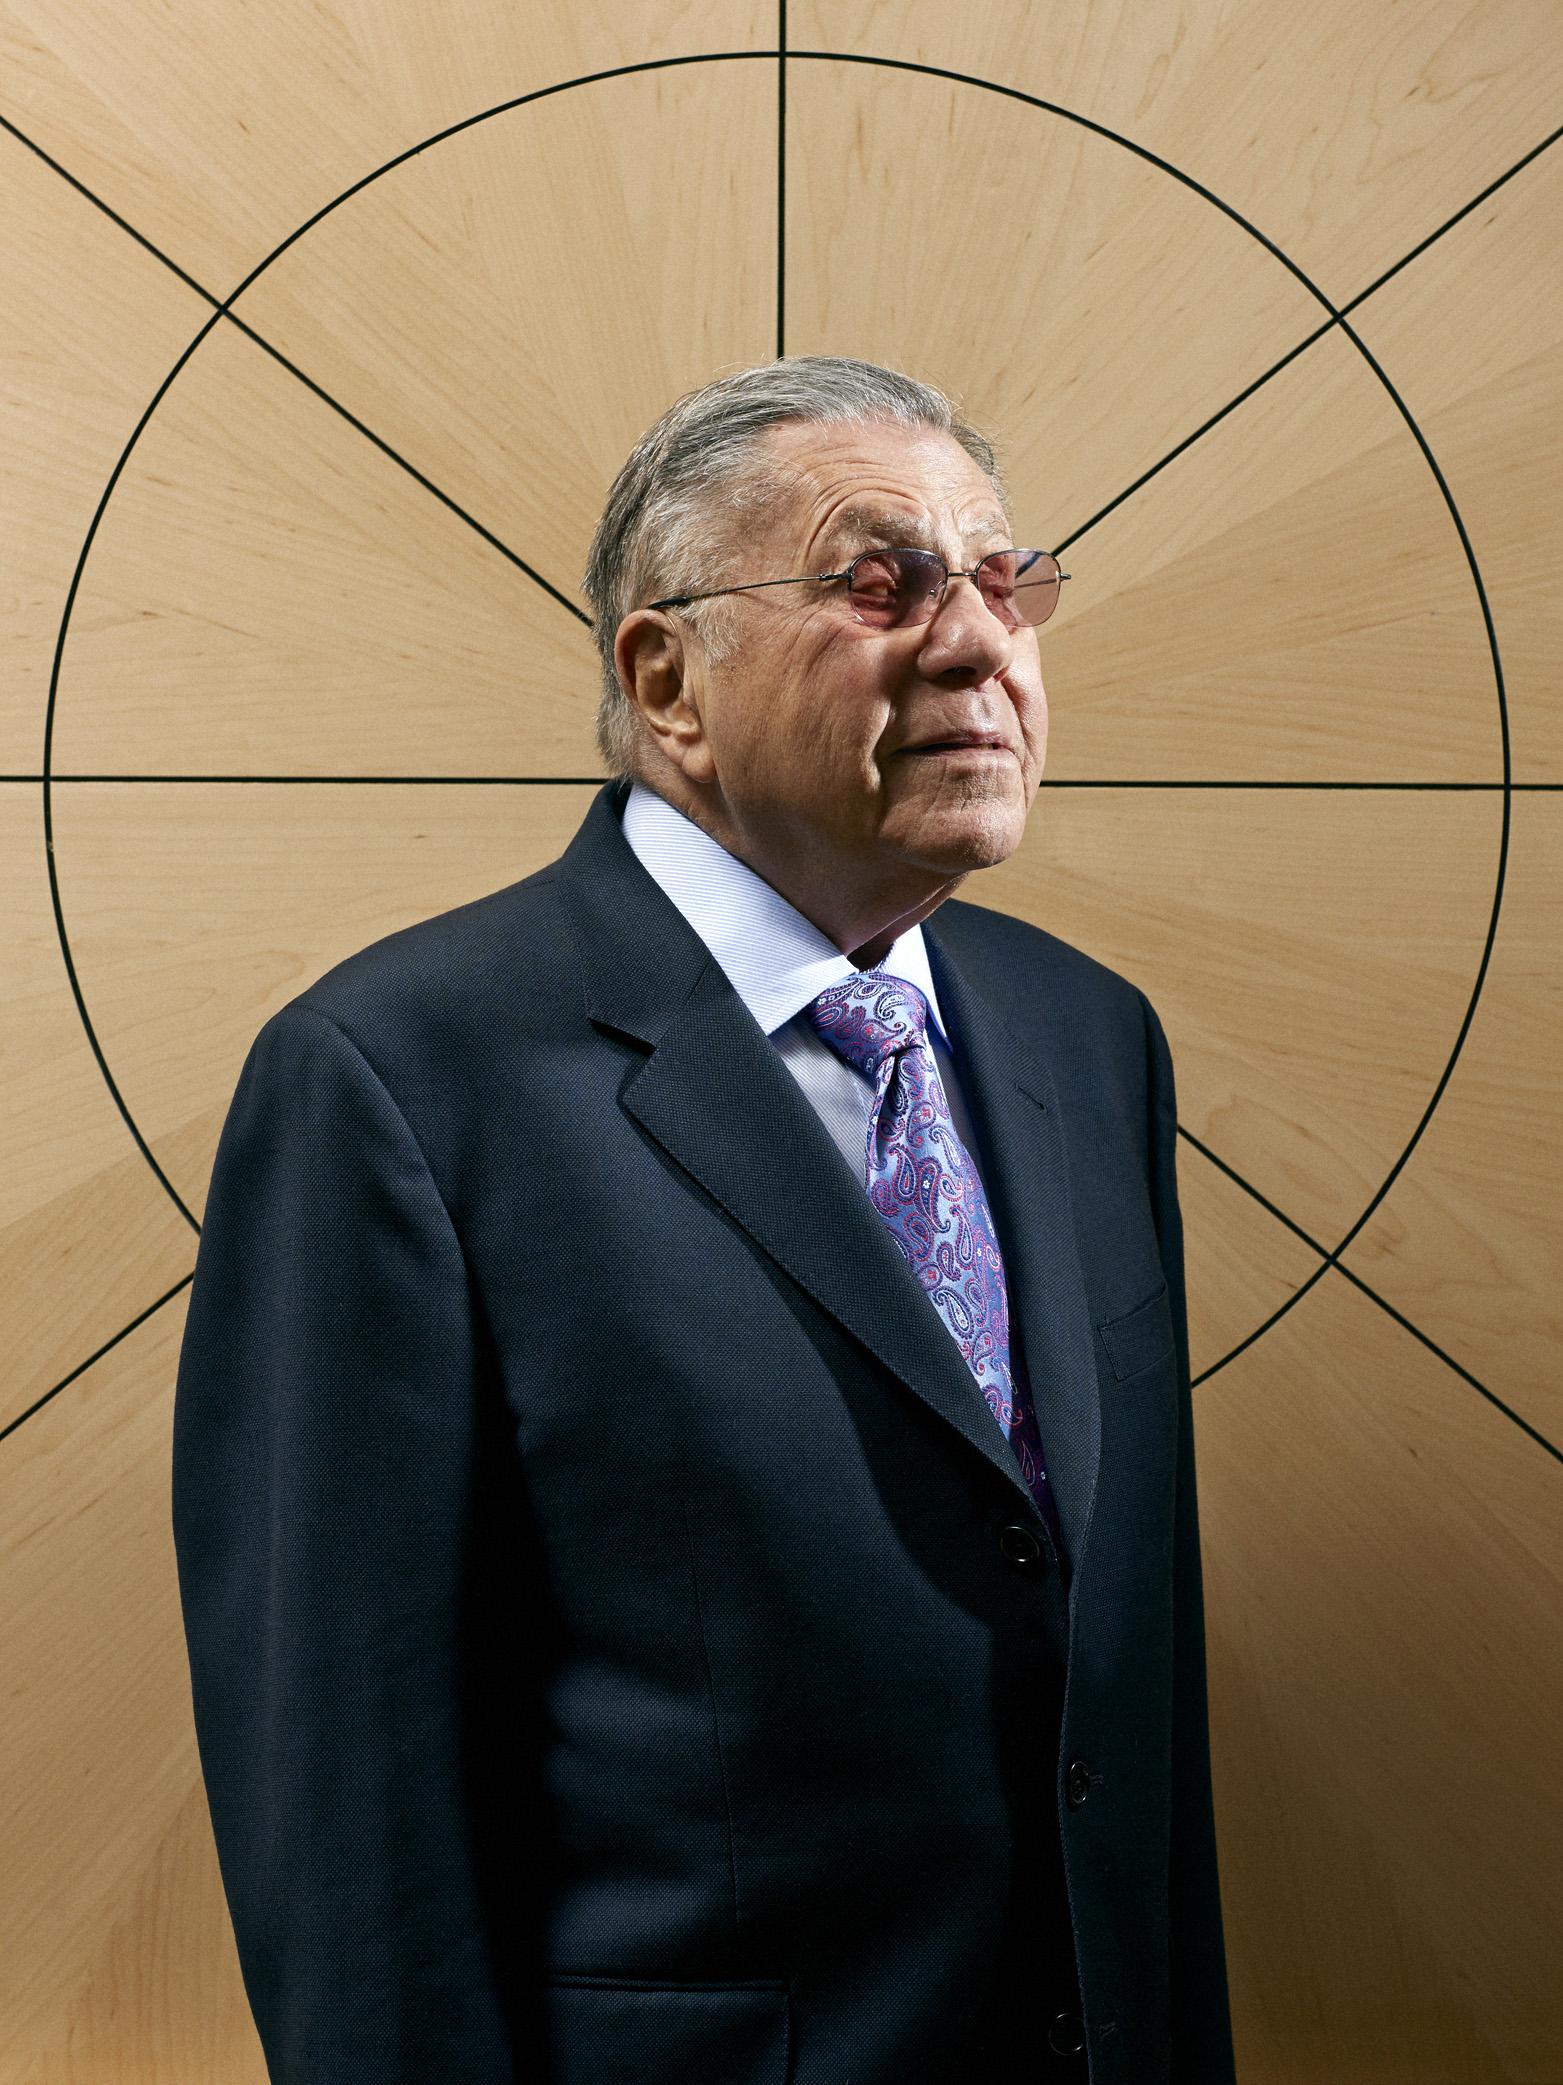 Caliper CEO Herb Greenberg